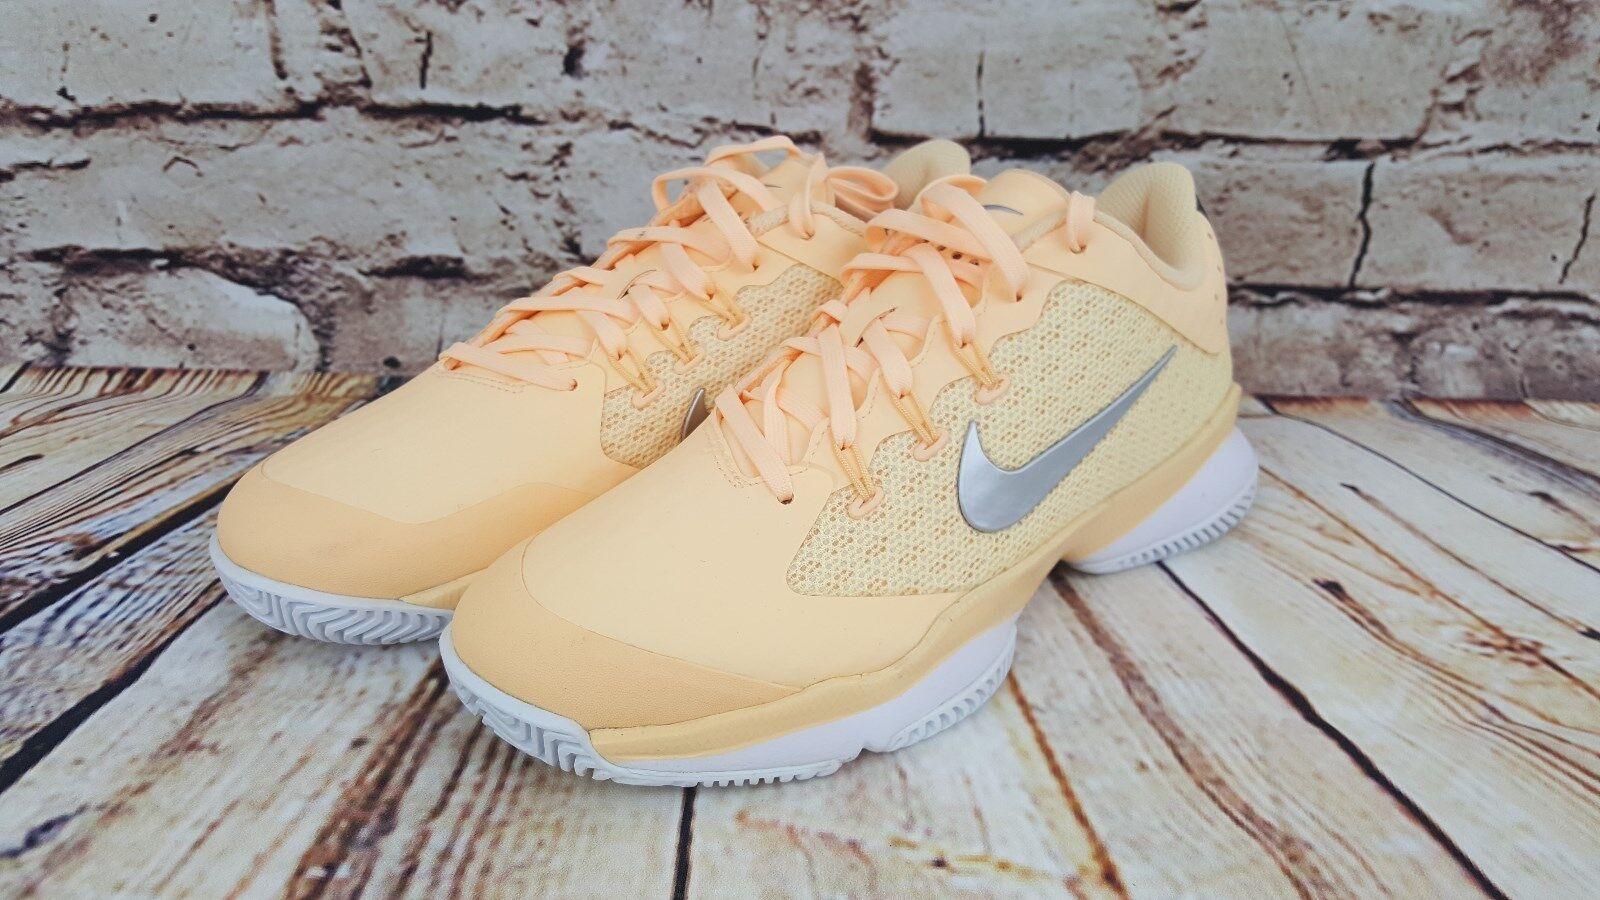 Niko Court Air Zoom Ultra  Hard Court Wouomo Tennis scarpe  fabbrica diretta